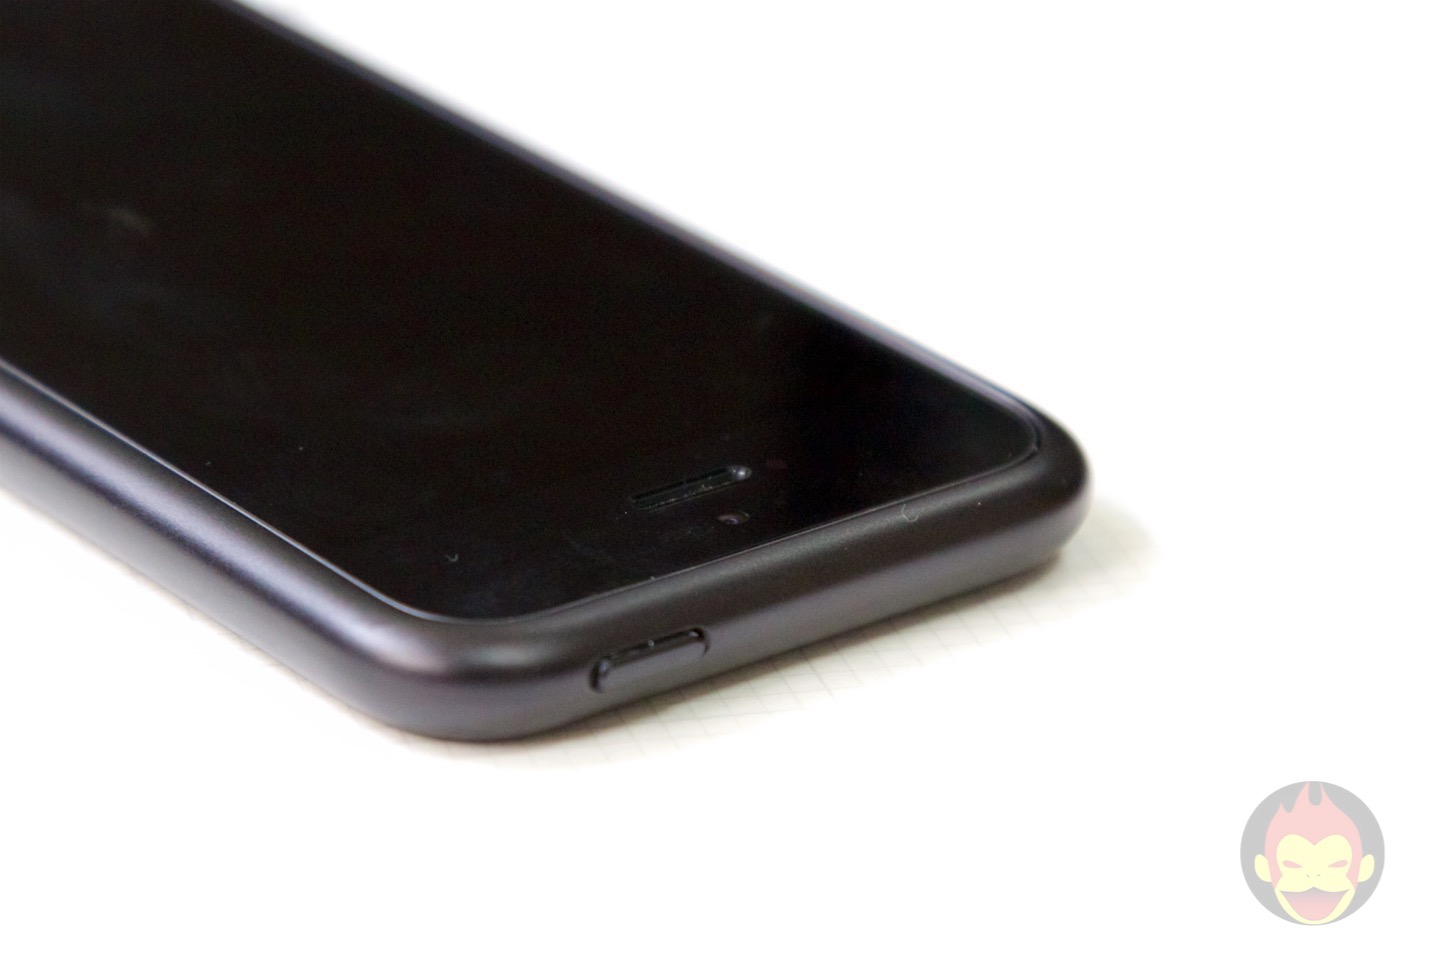 SQUAIR iPhone SE Curvacious Bumper